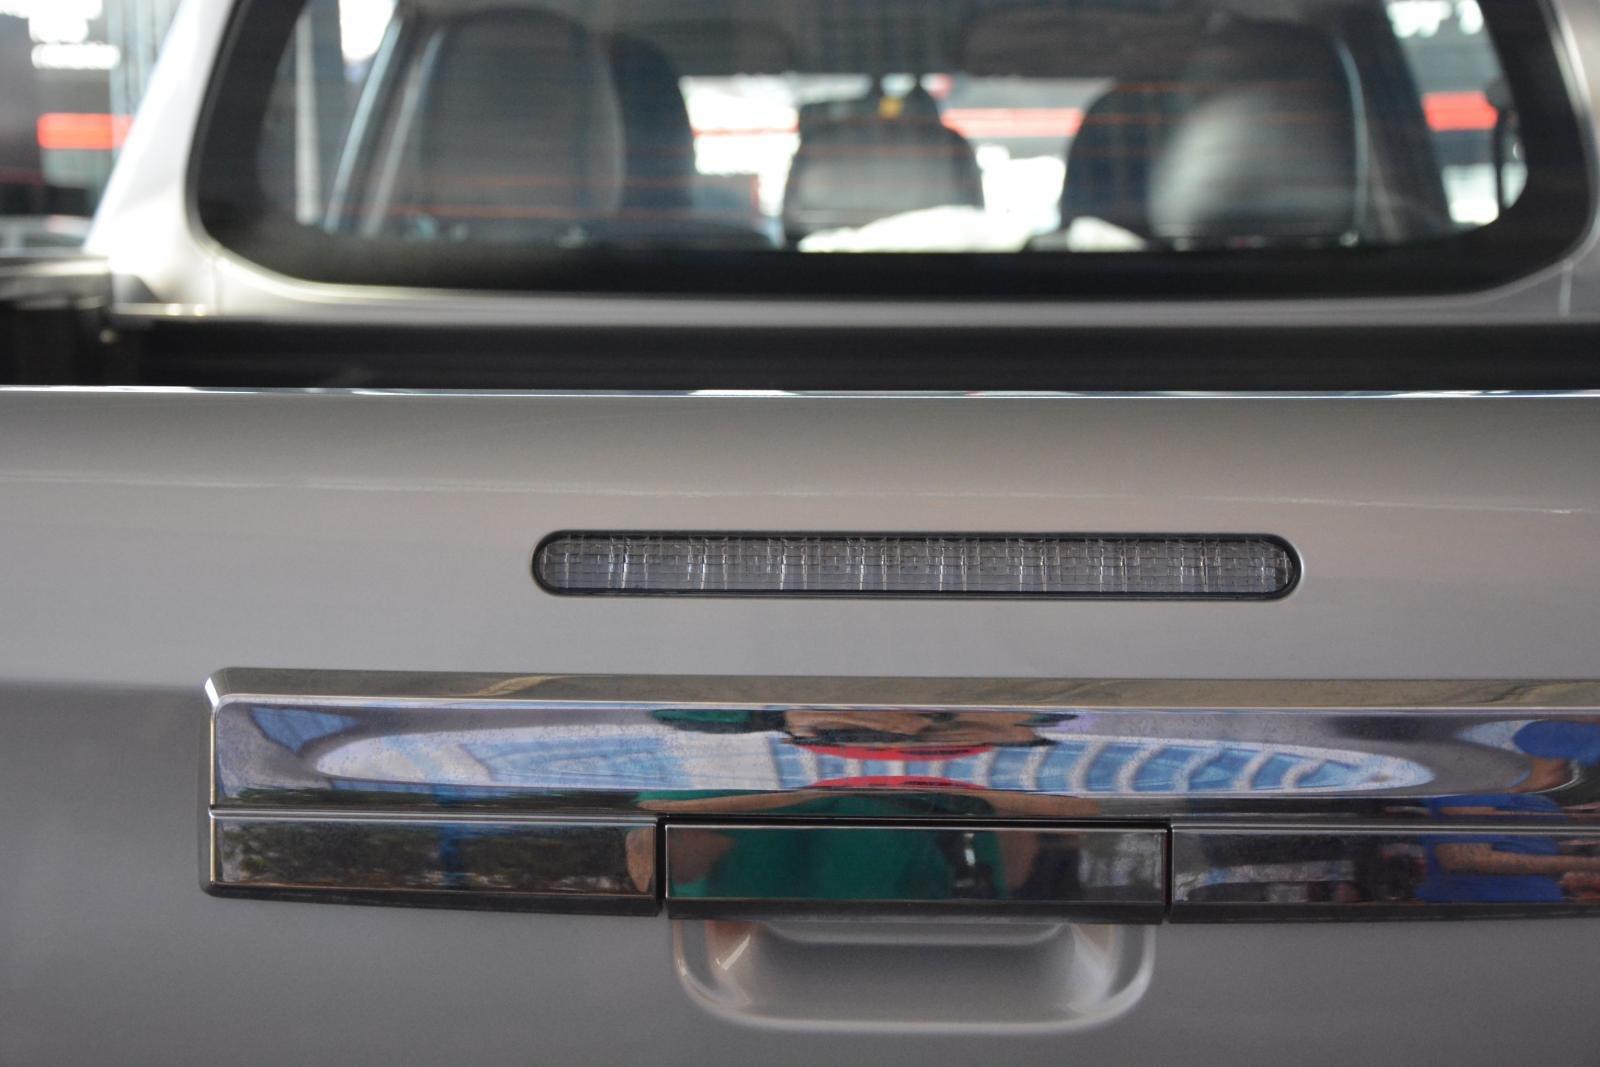 Ảnh chụp tay nắm cửa xe Mitsubishi Triton 2019